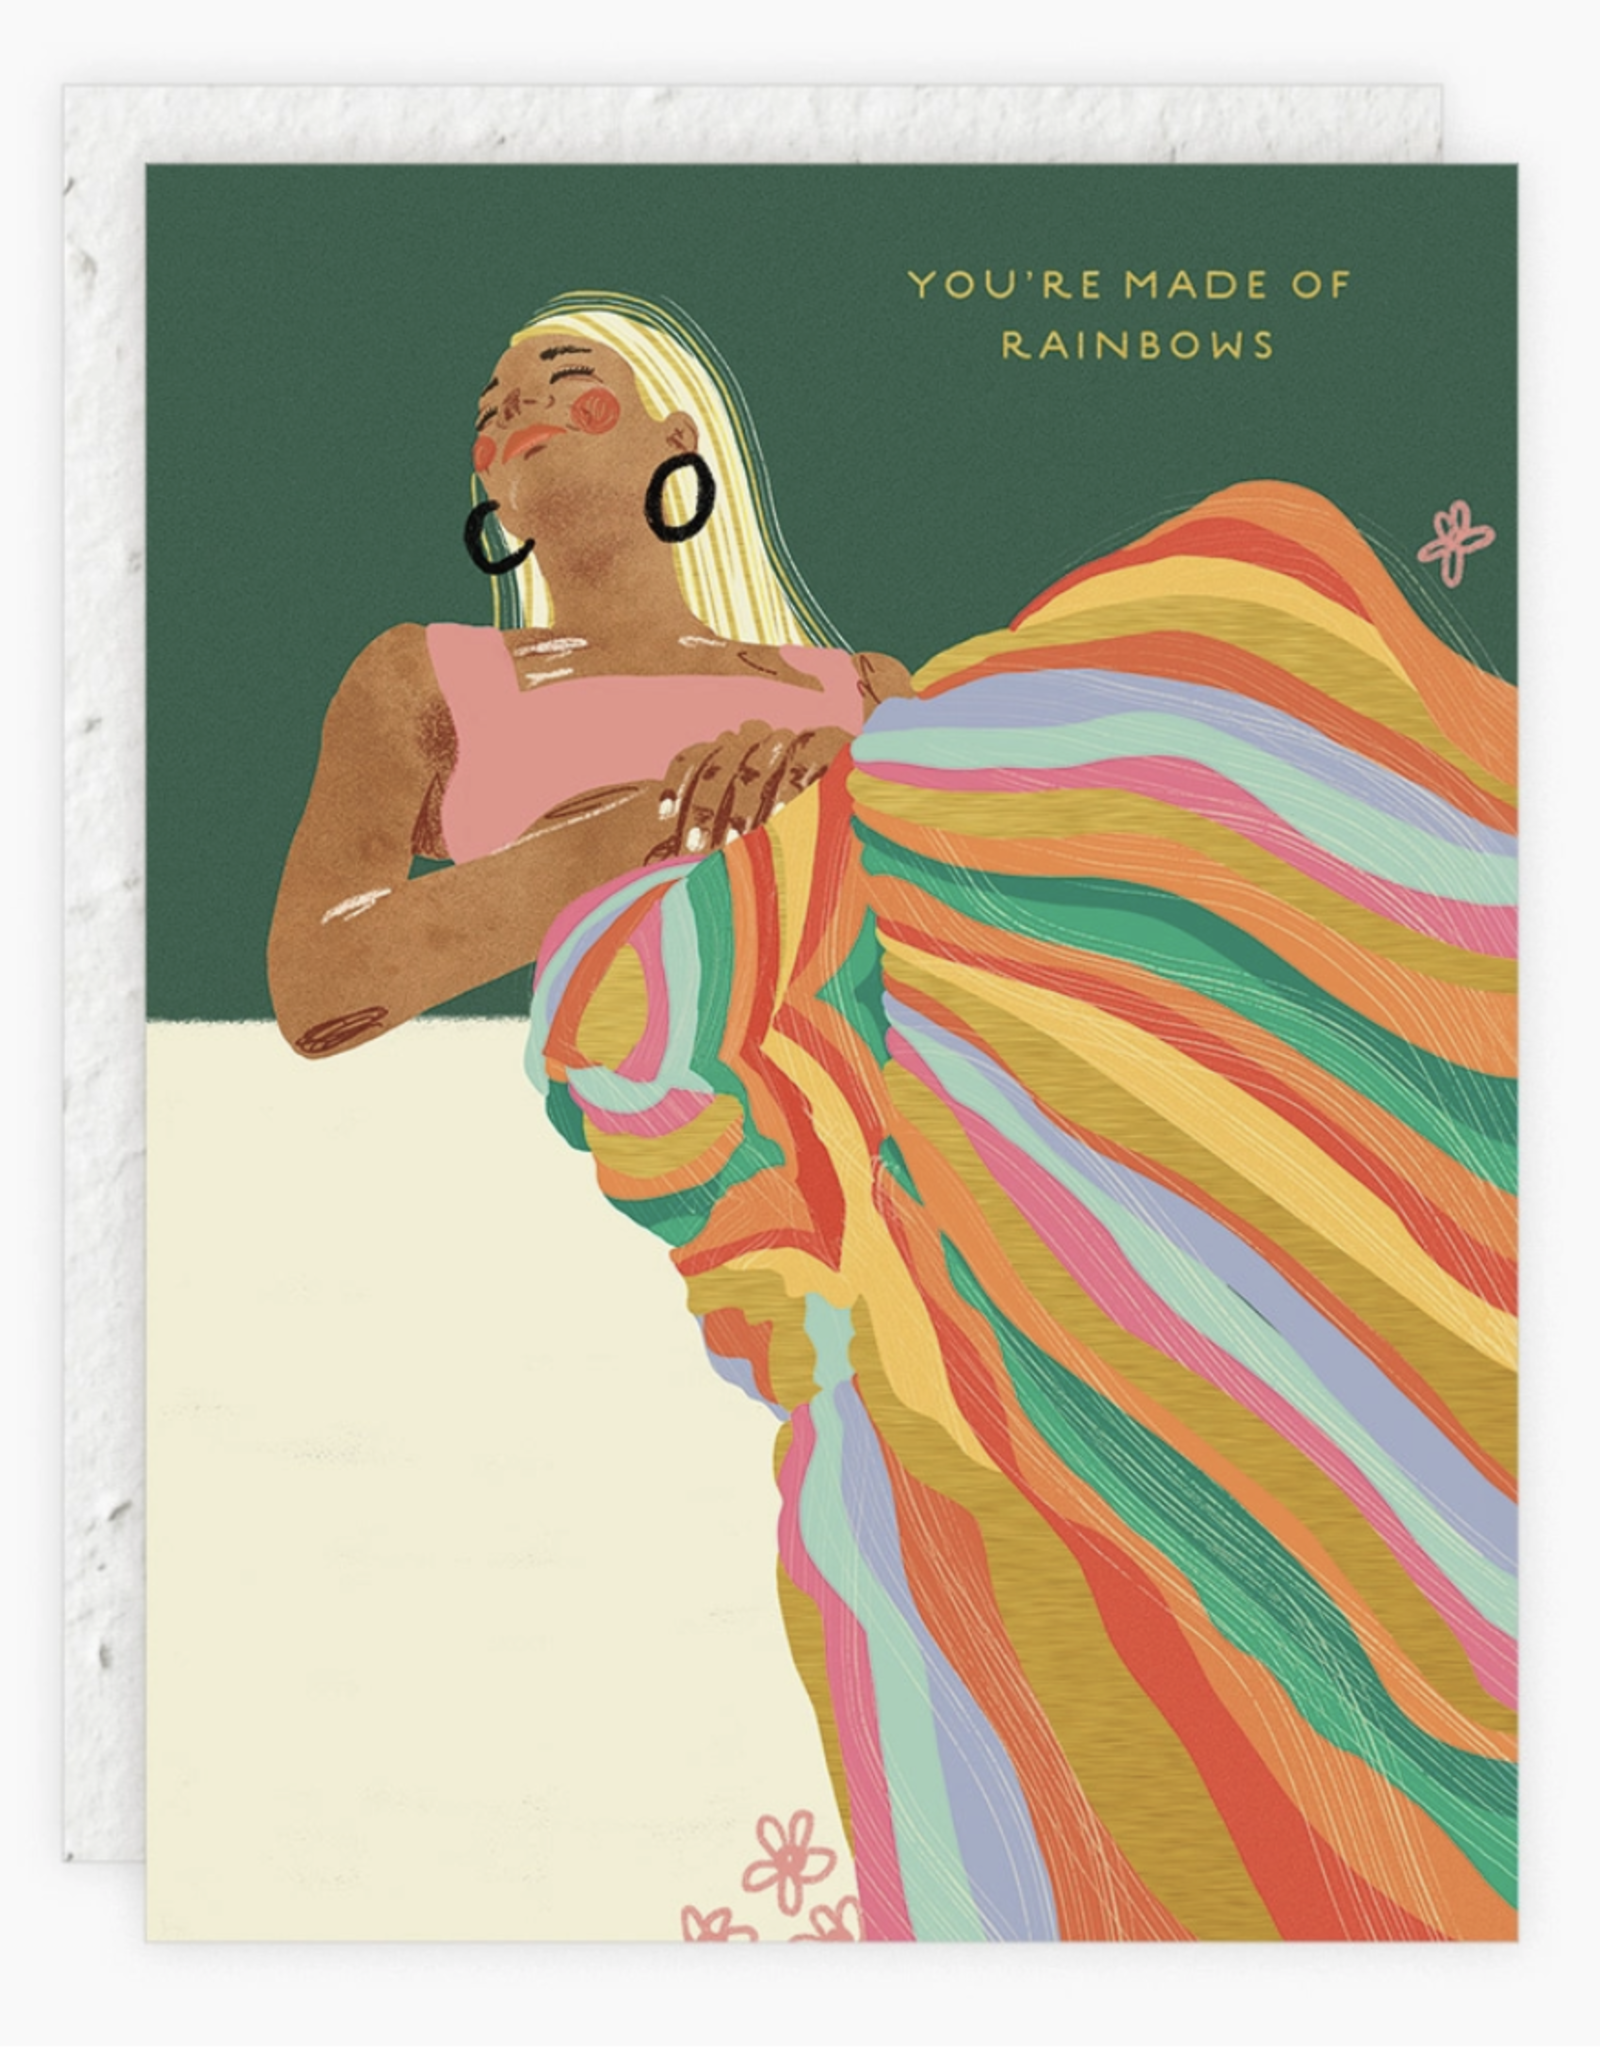 Made of Rainbows Birthday Card